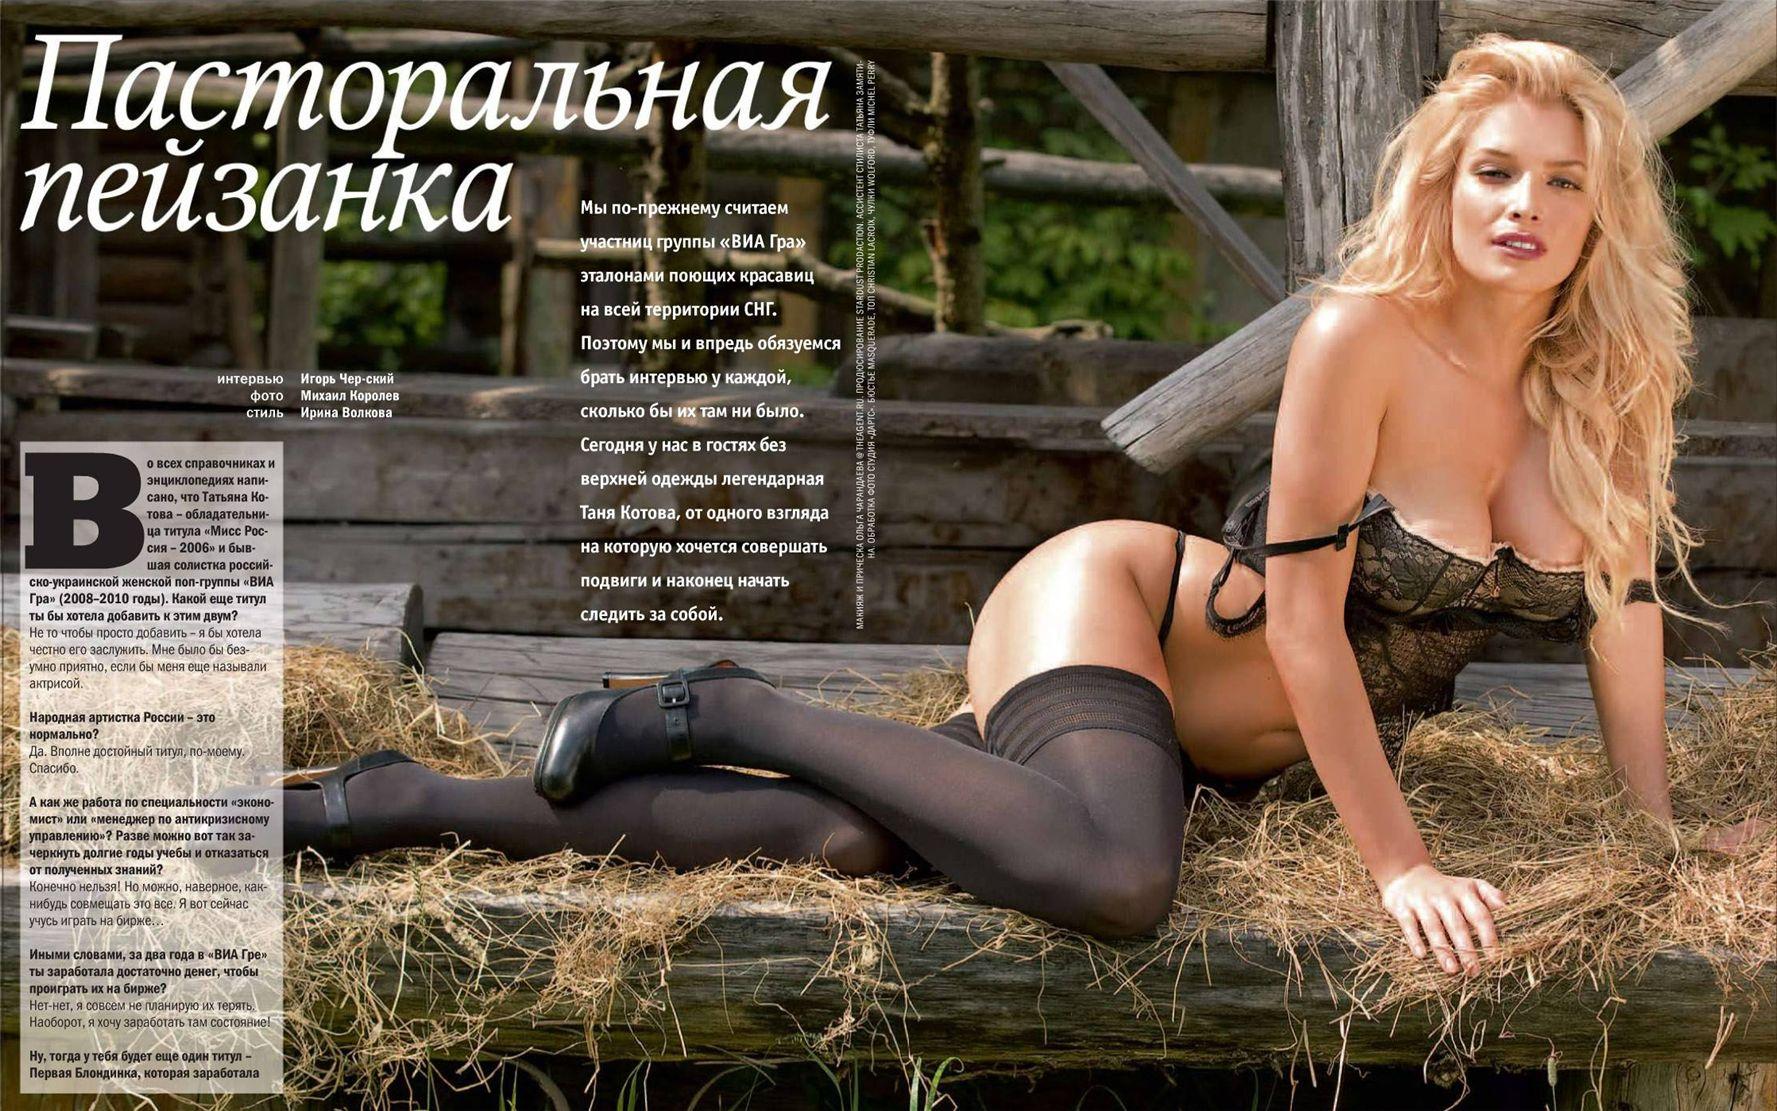 голая Татьяна Котова из группы Виагра